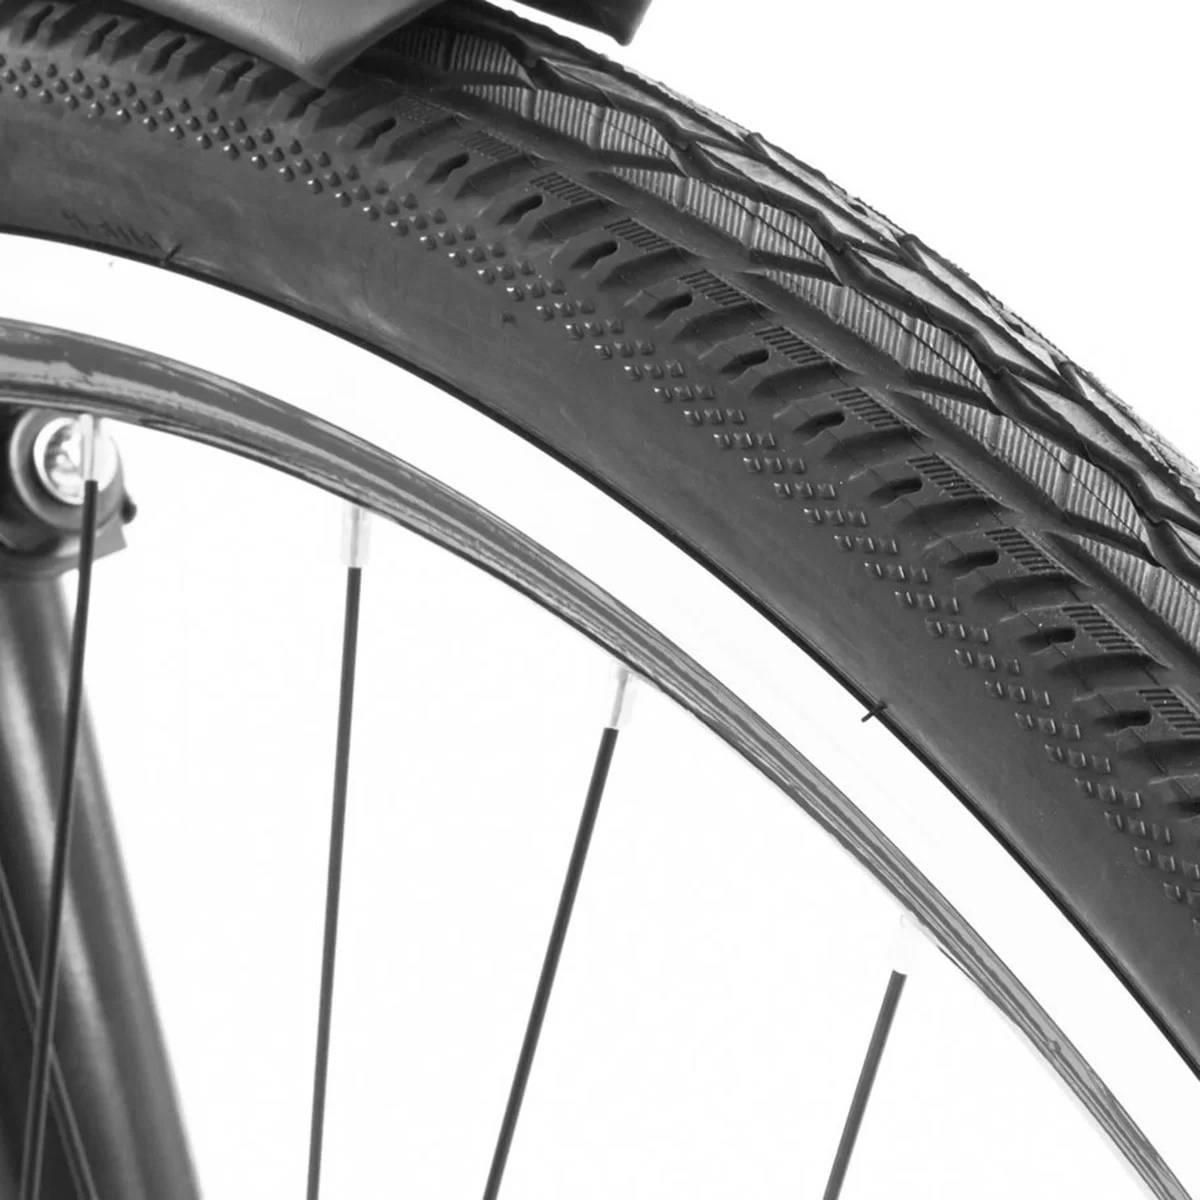 BICICLETA TITO DOWNTOWN AR0 700 - Cicles Jahn